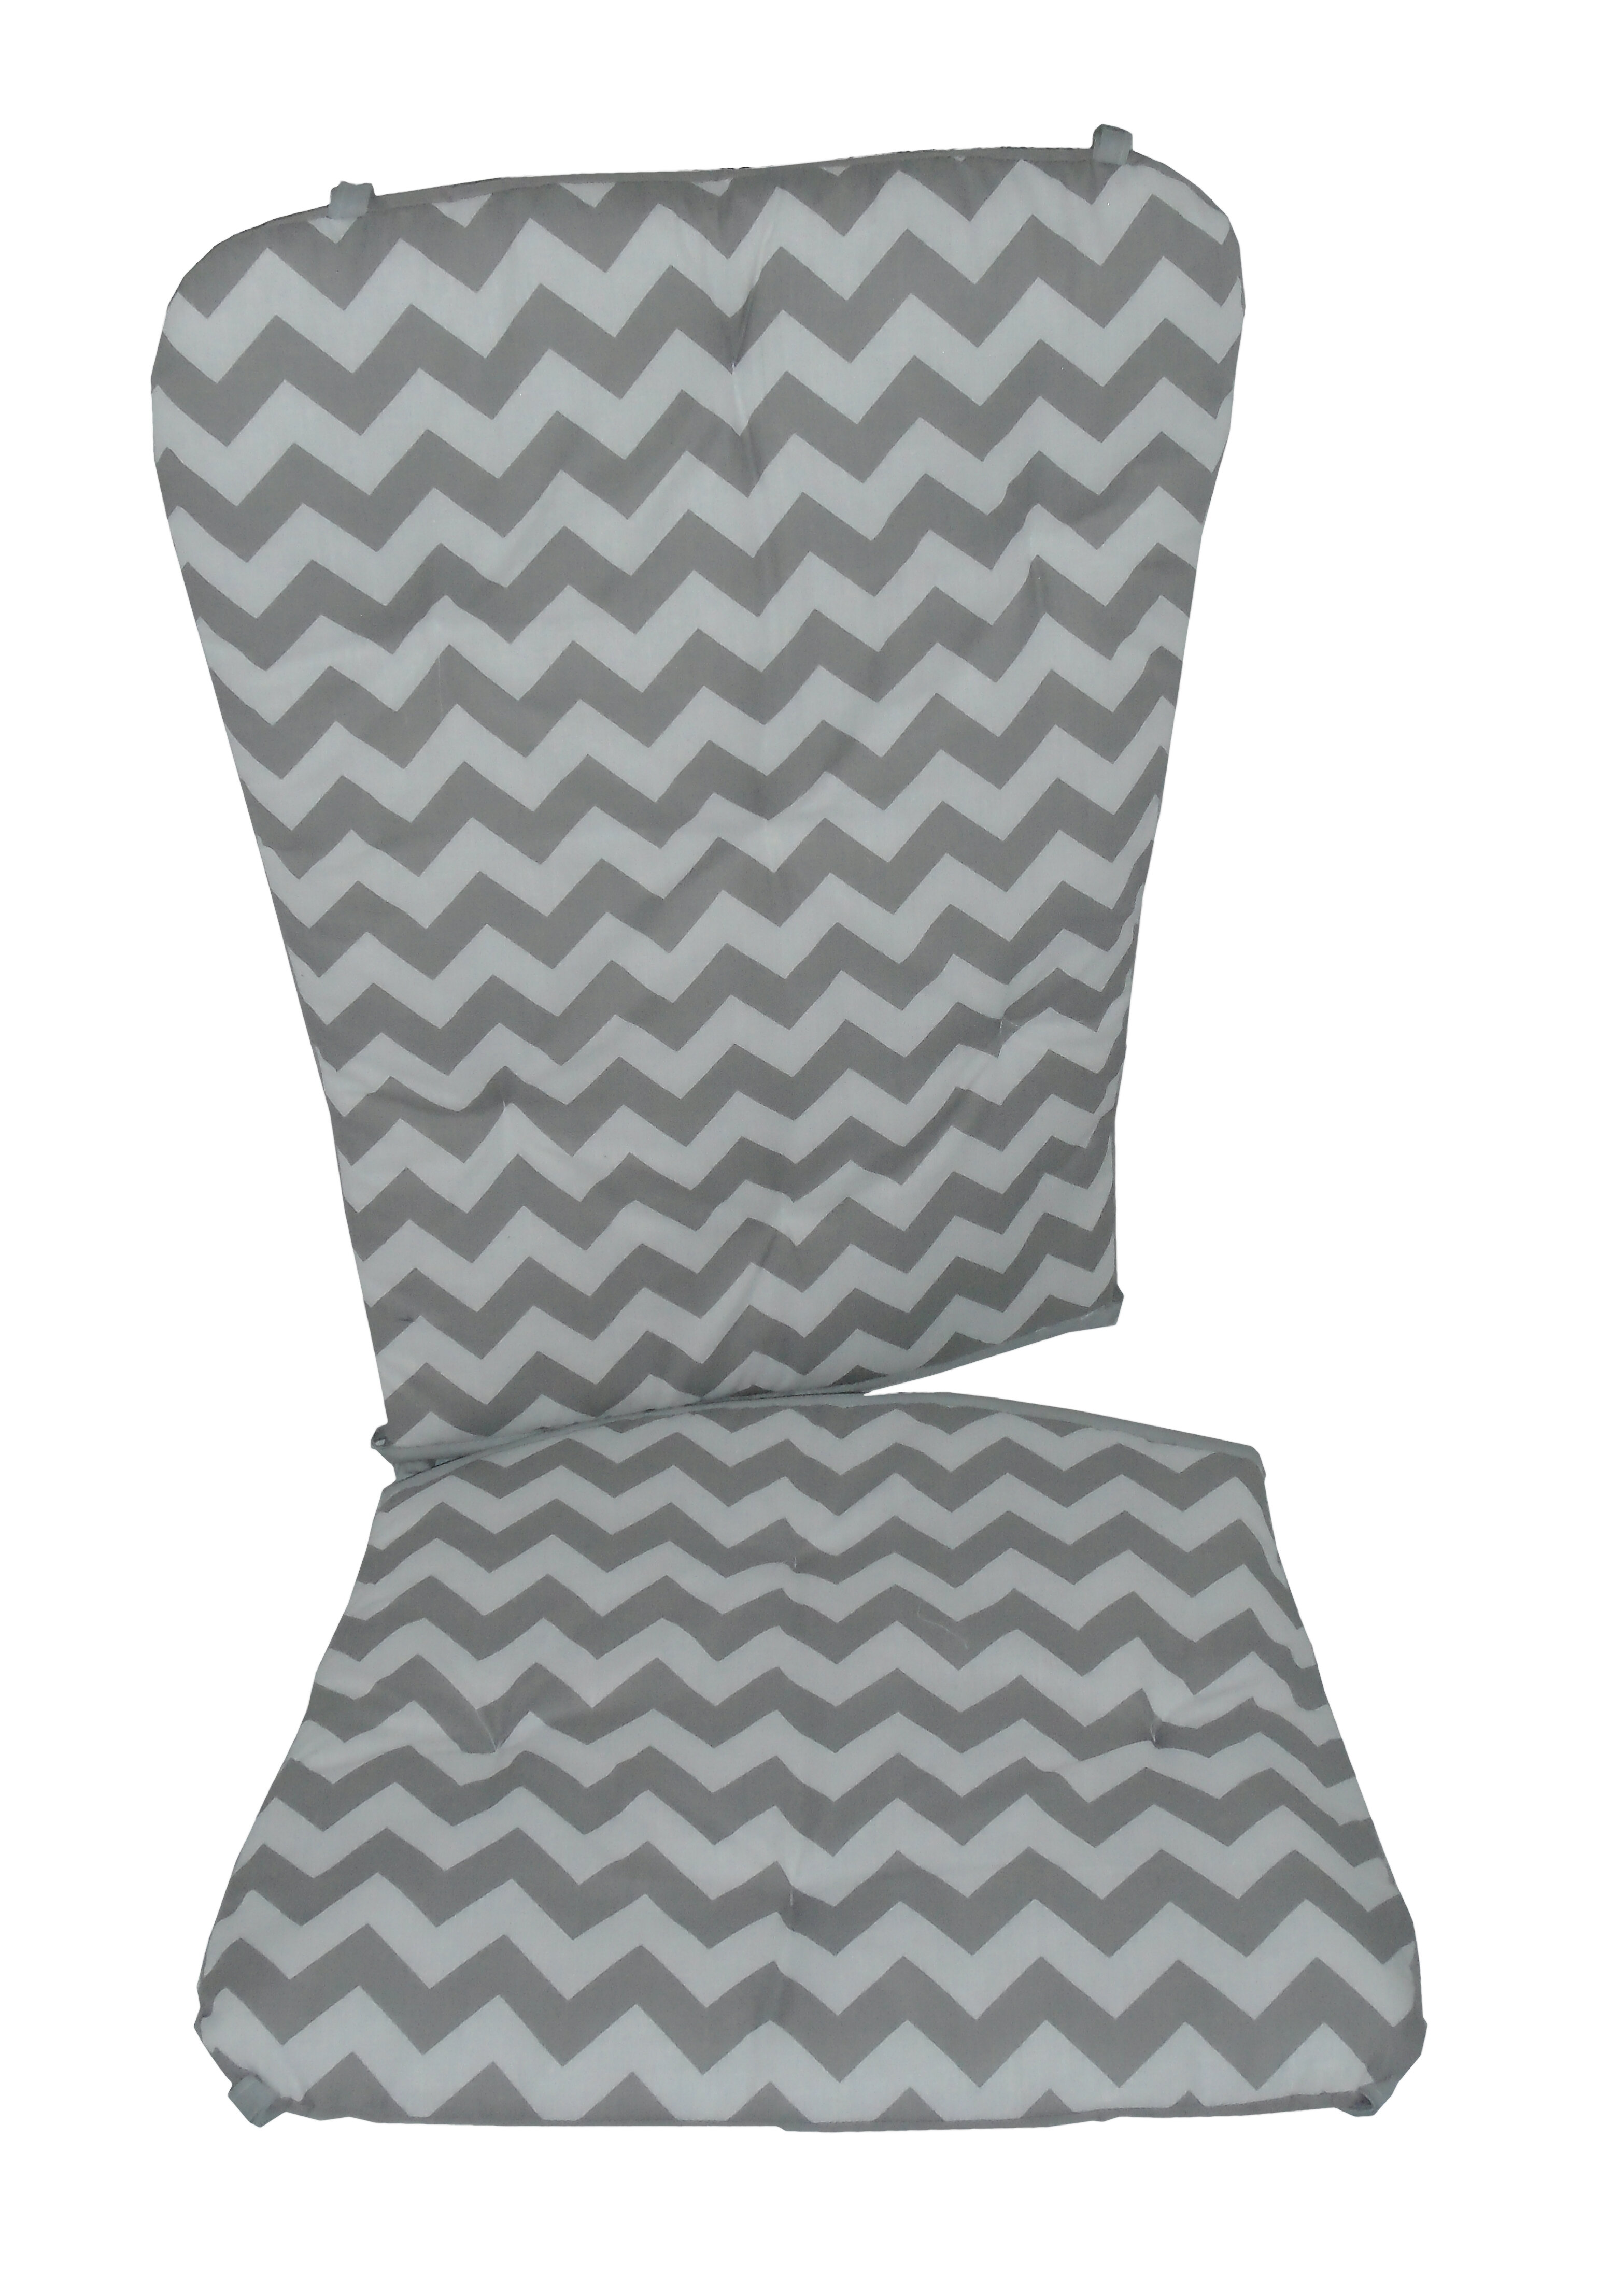 Exceptionnel BabyDoll Bedding Chevron Rocking Chair Cushion U0026 Reviews   Wayfair